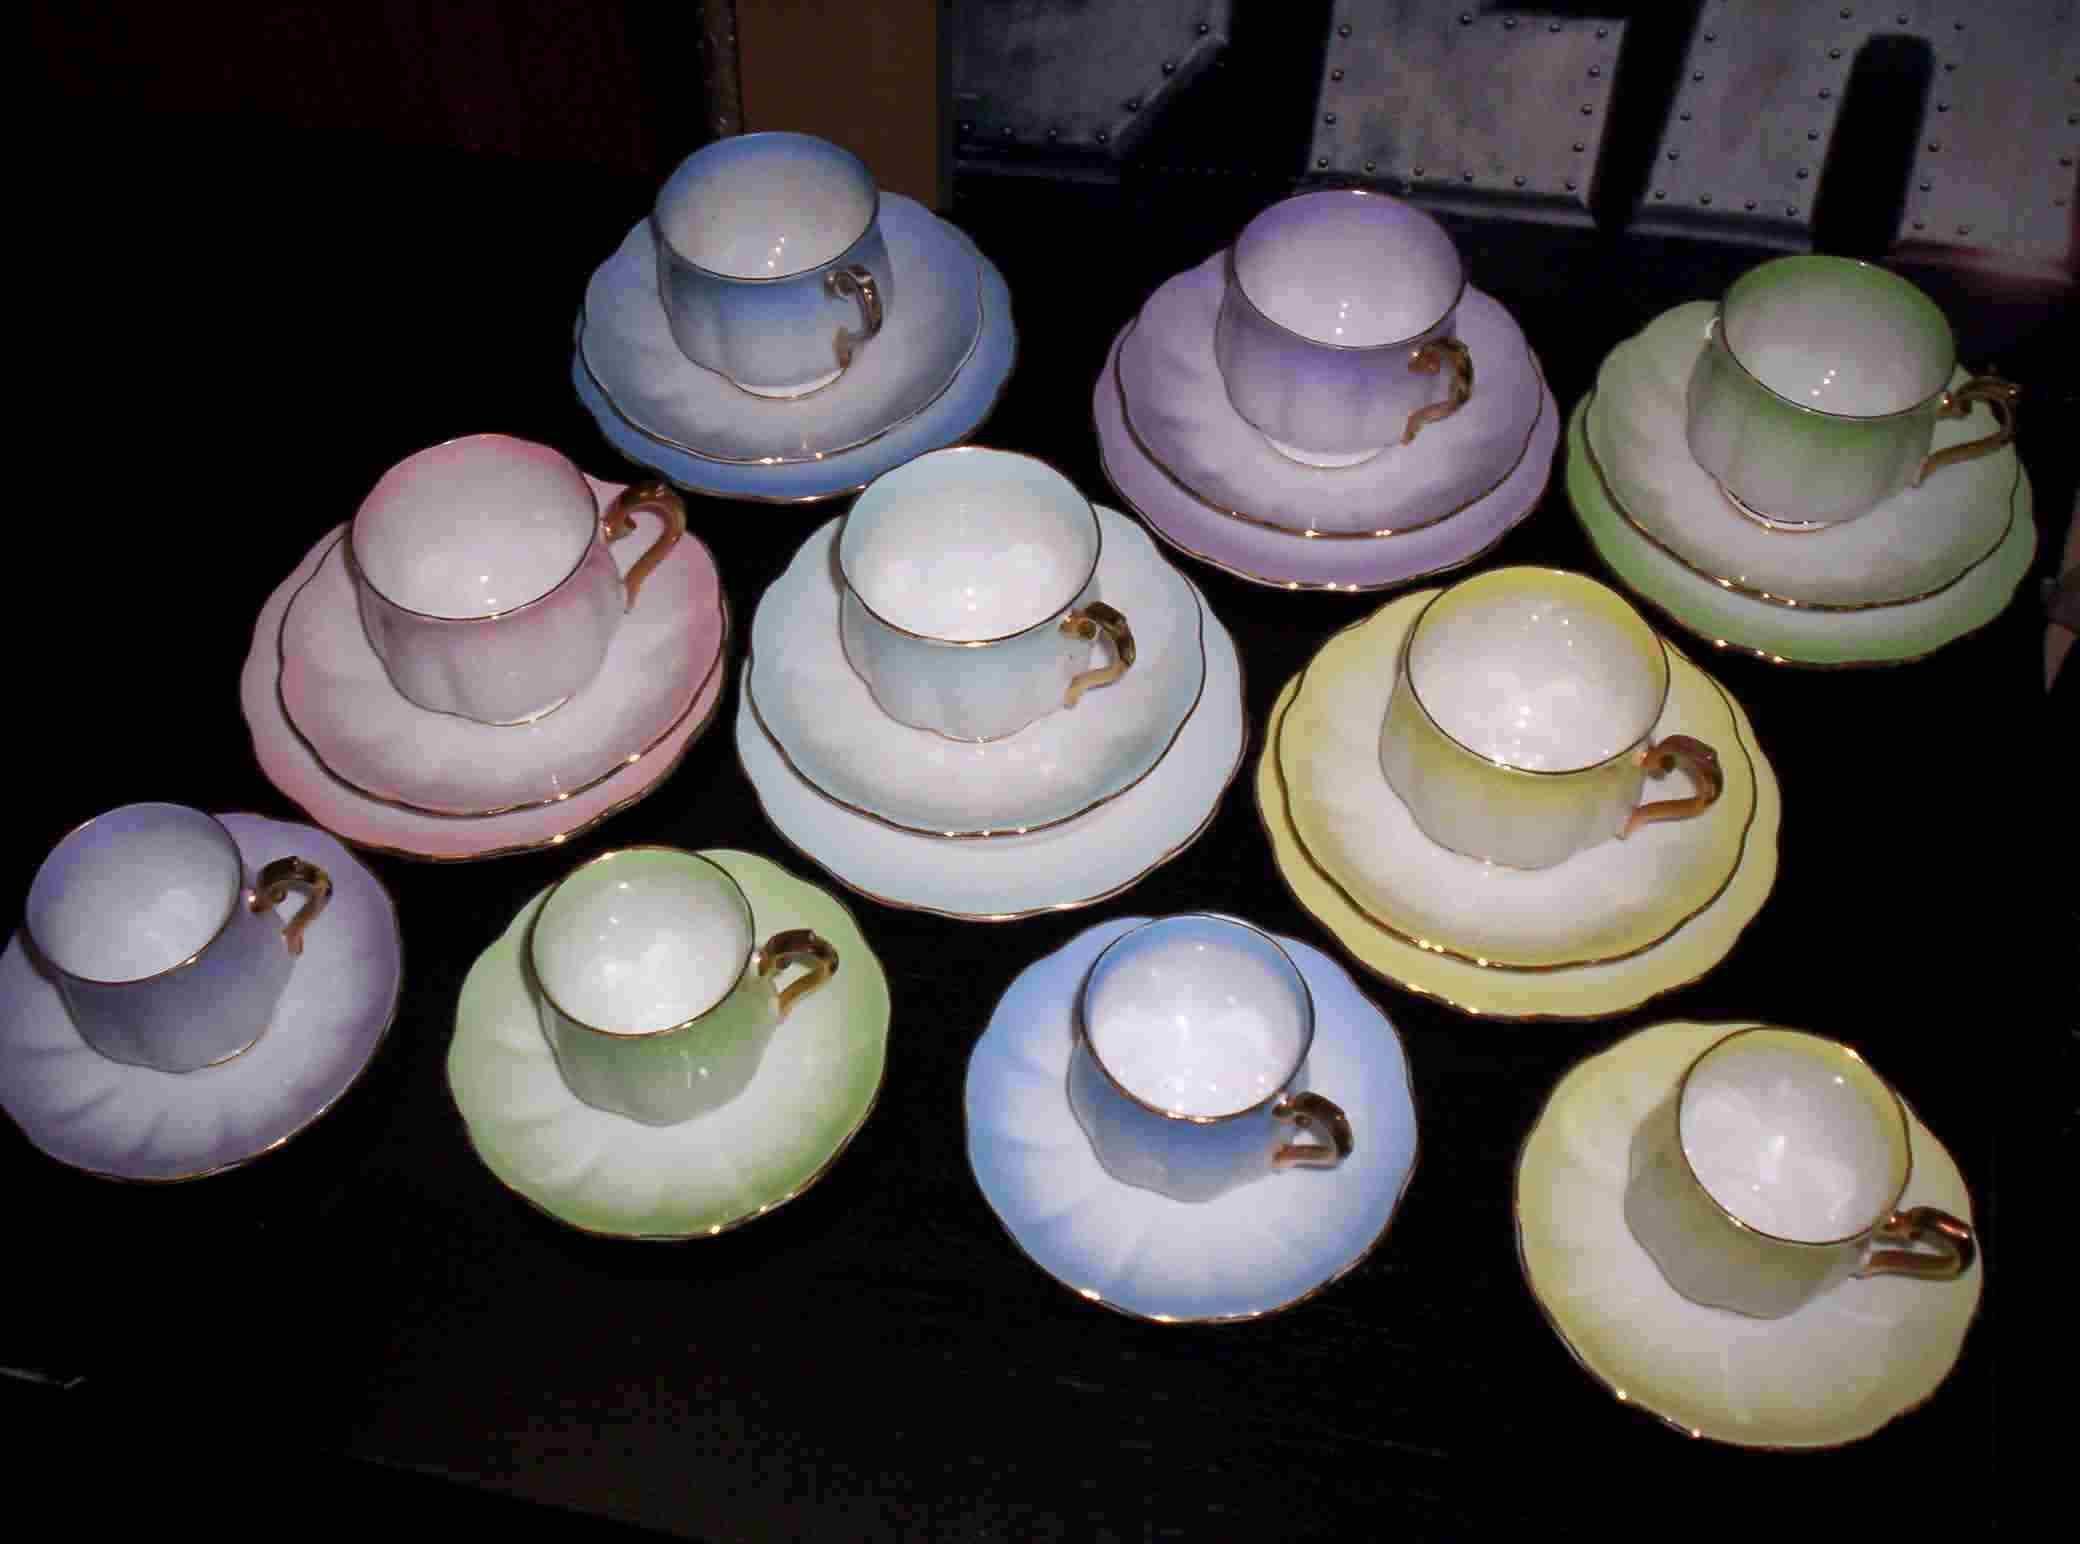 ROYAL ALBERT HARLEQUIN TEASET & COFFEE CUPS & SAUCERS - Item ...